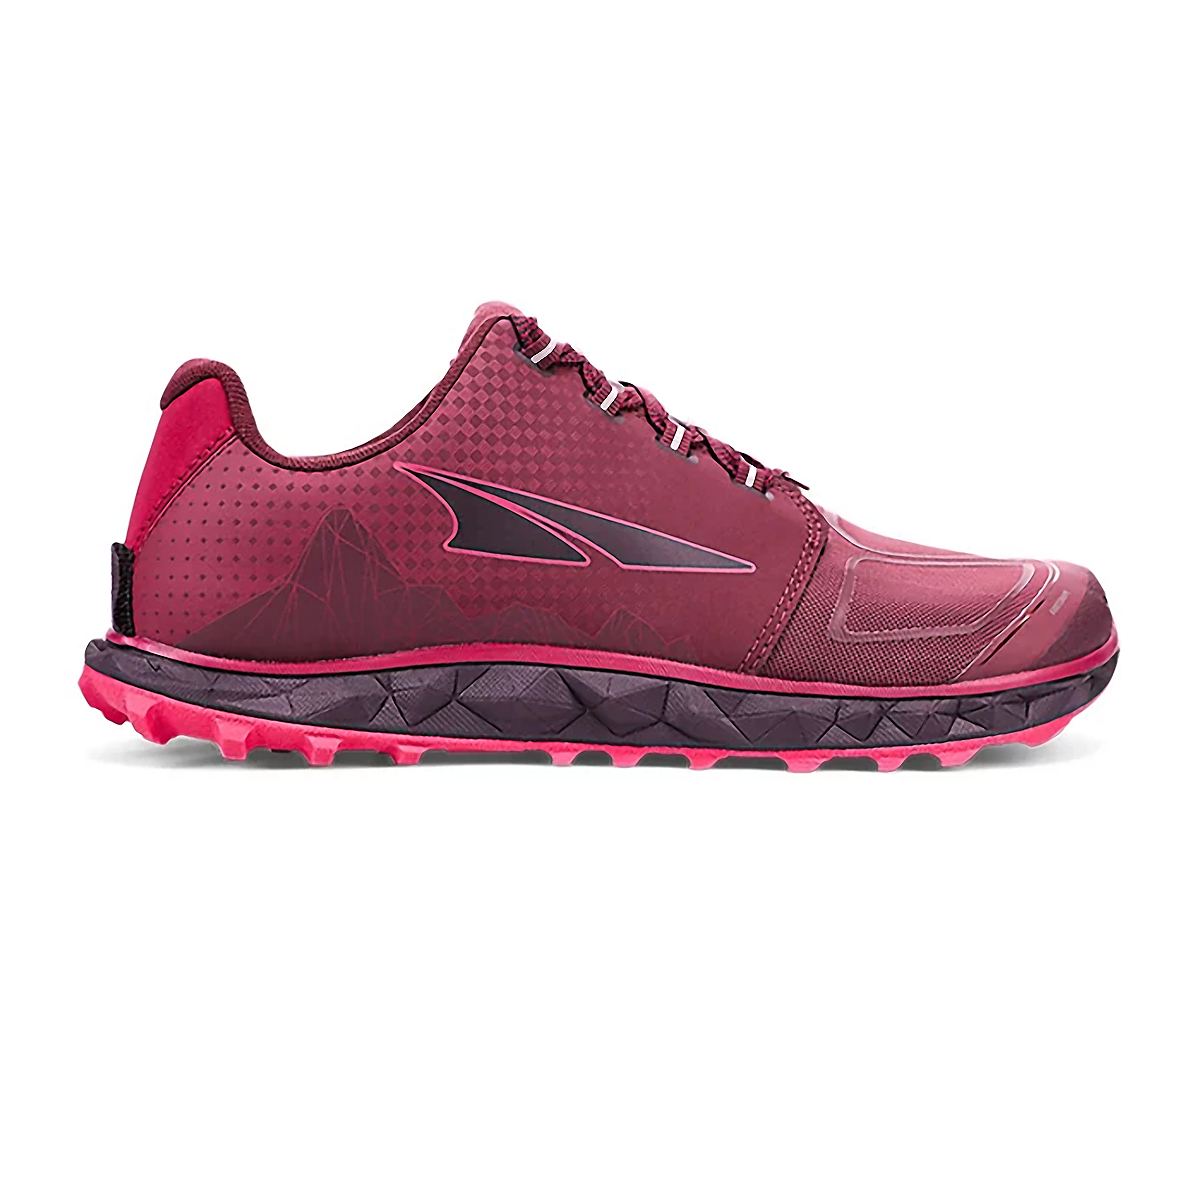 Women's Altra Superior 4.5 Trail Running Shoe - Color: Black/Pink - Size: 6 - Width: Regular, Black/Pink, large, image 1